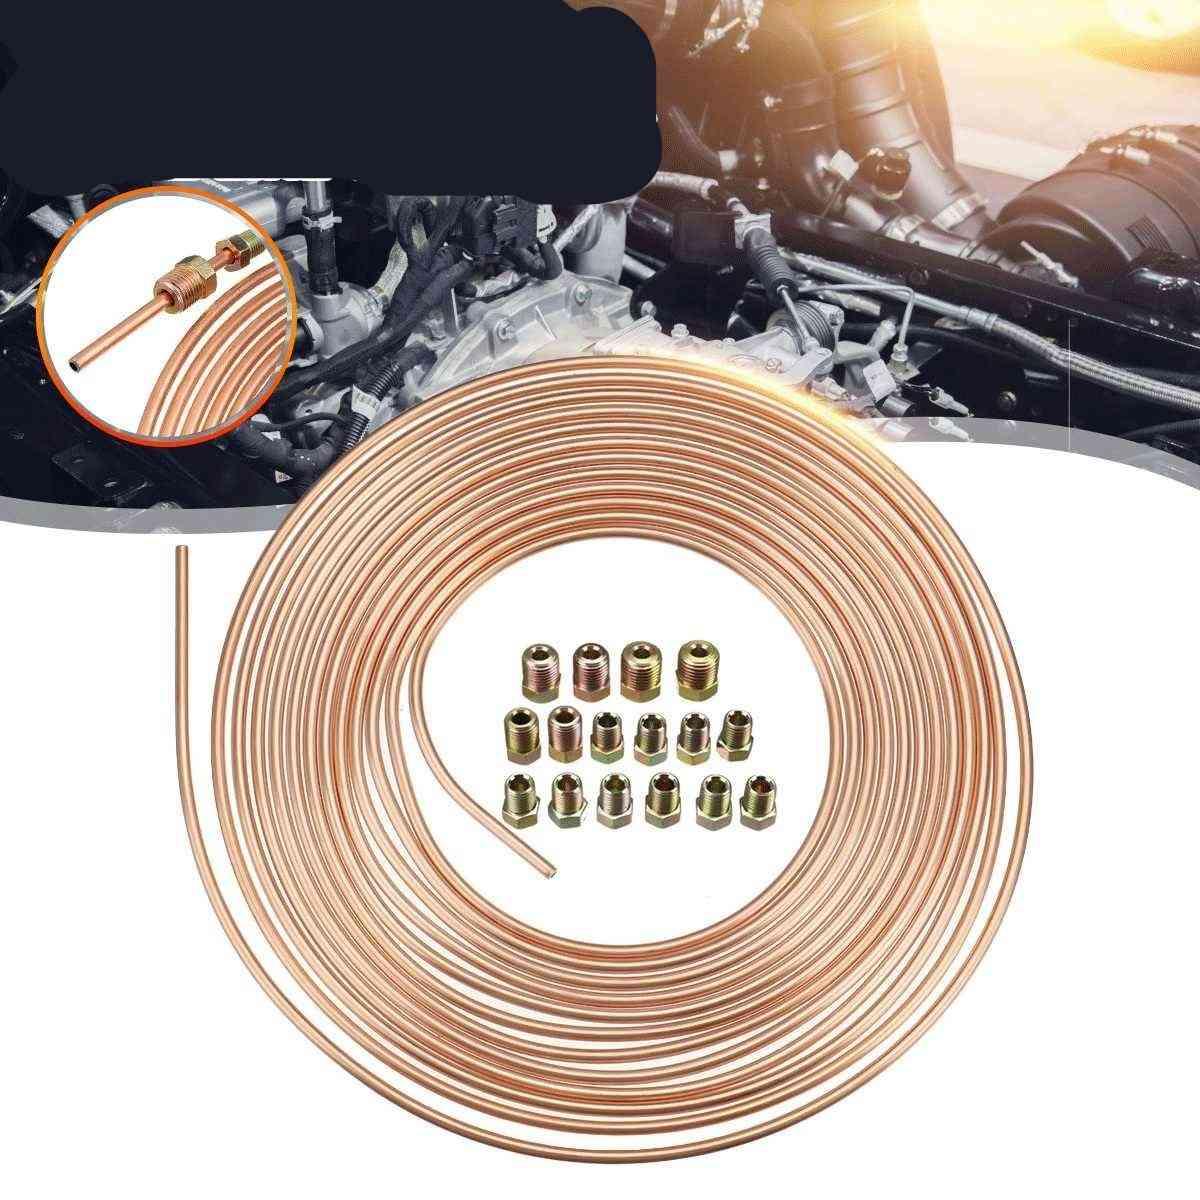 Copper Nickel Brake Pipe Hose Line Piping Tube